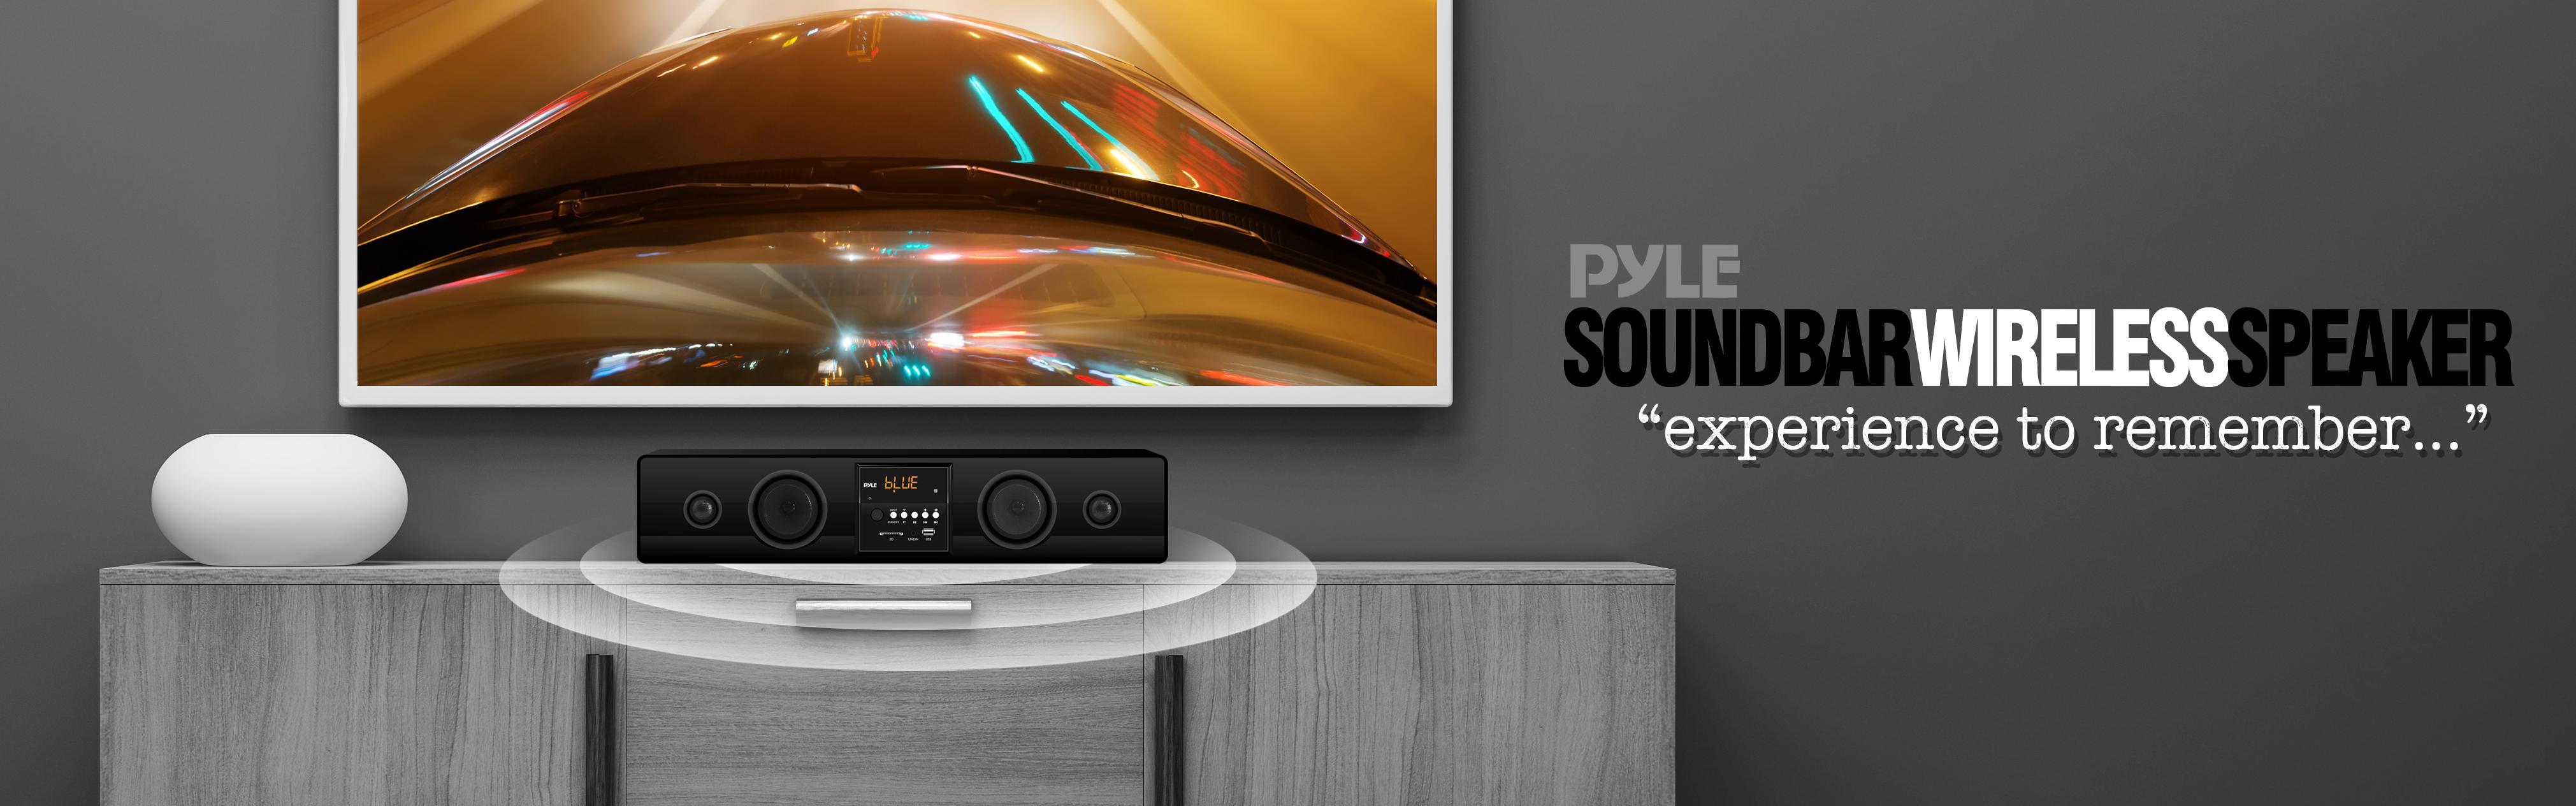 Pyle WiFi Bluetooth SoundBar, Wireless Music Streaming Surround Sound  Speaker System, USB/SD/MP3 Readers, FM Radio, 300 Watt (PSBV210WIFI)